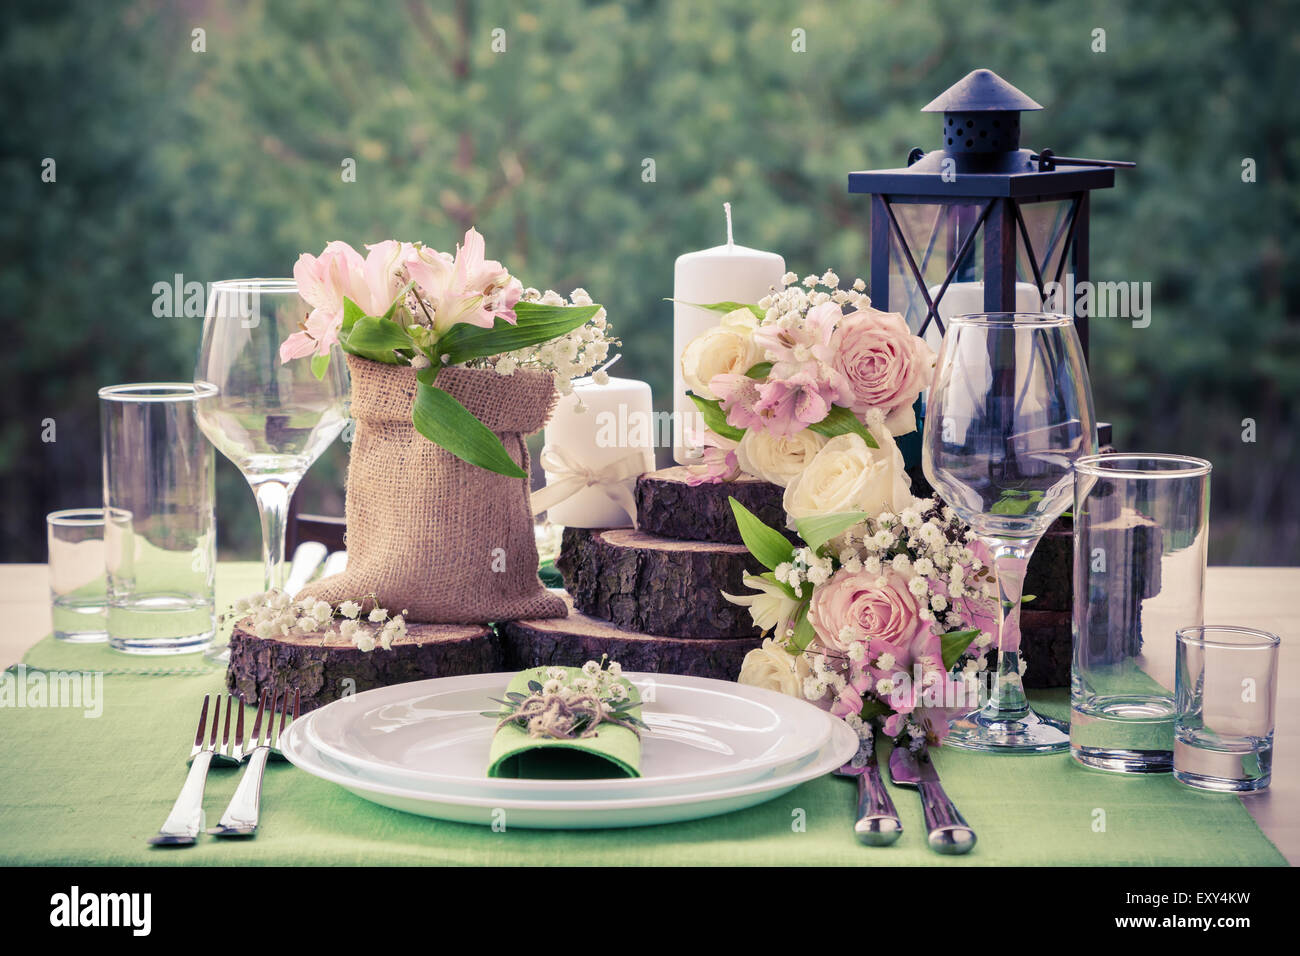 Wedding Table Setting Stock Photos & Wedding Table Setting Stock ...